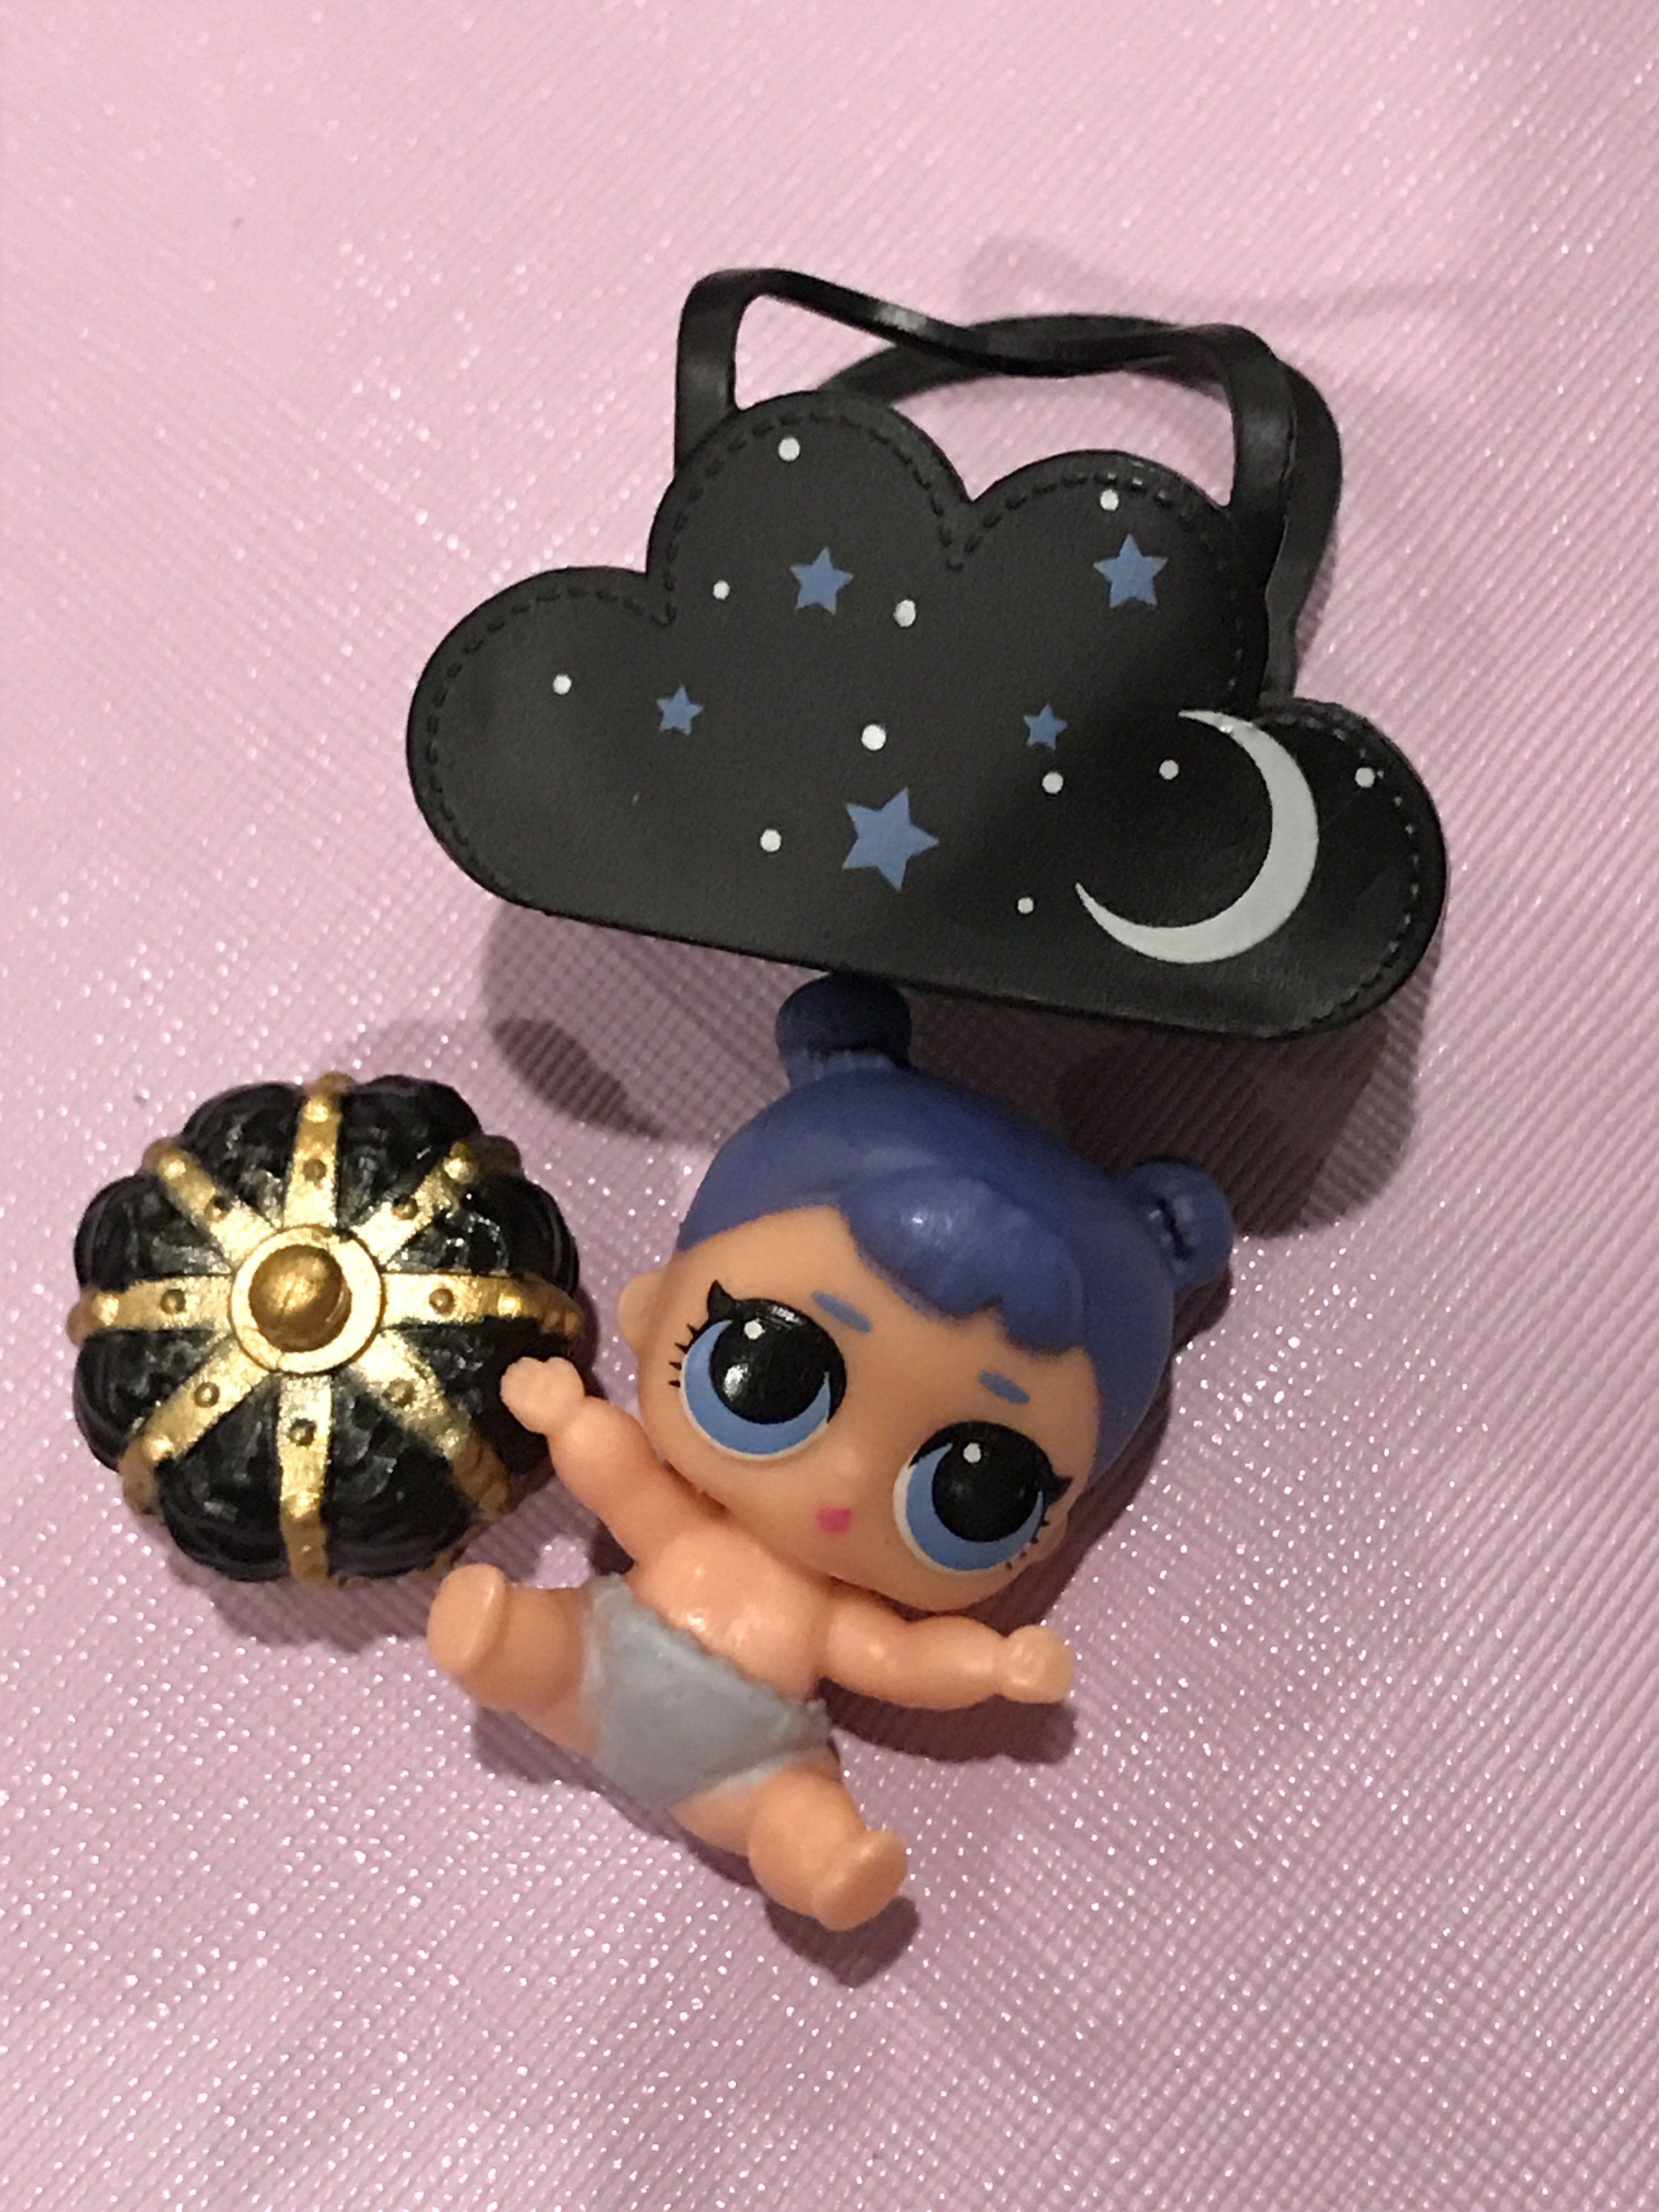 LOL Surprise Series 3 Big Sister GO-GO Gurl Doll Girl Kids Child Gift Toy D5